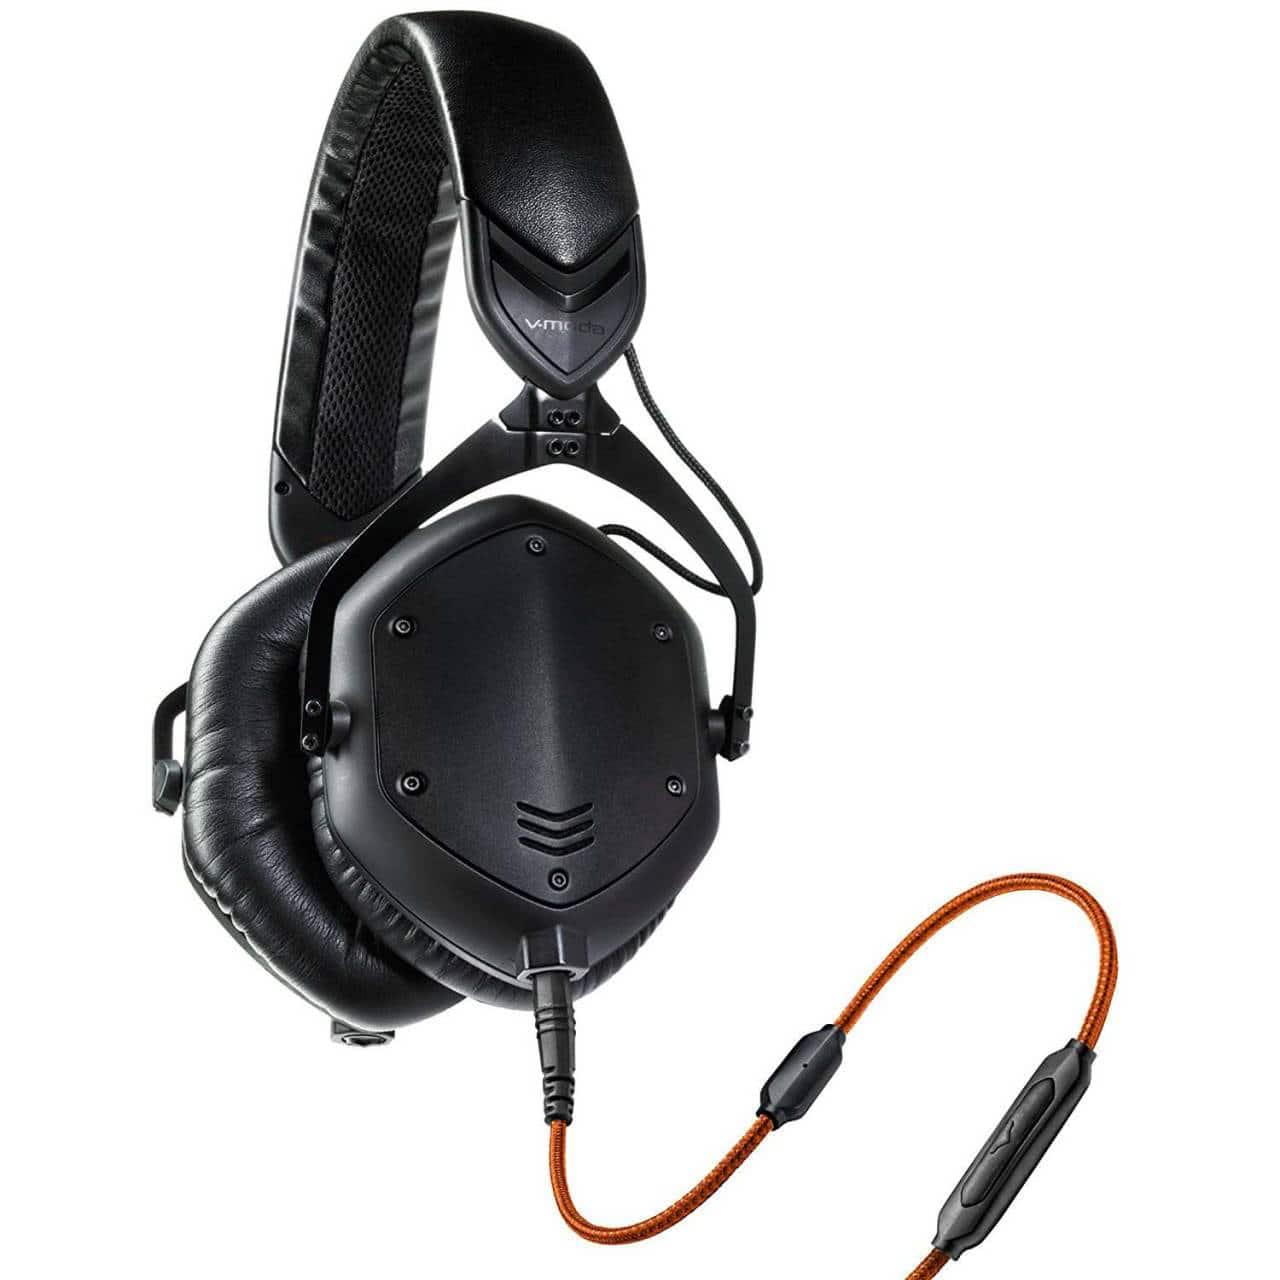 Roland V-Moda Crossfade M100 schwarz/orange